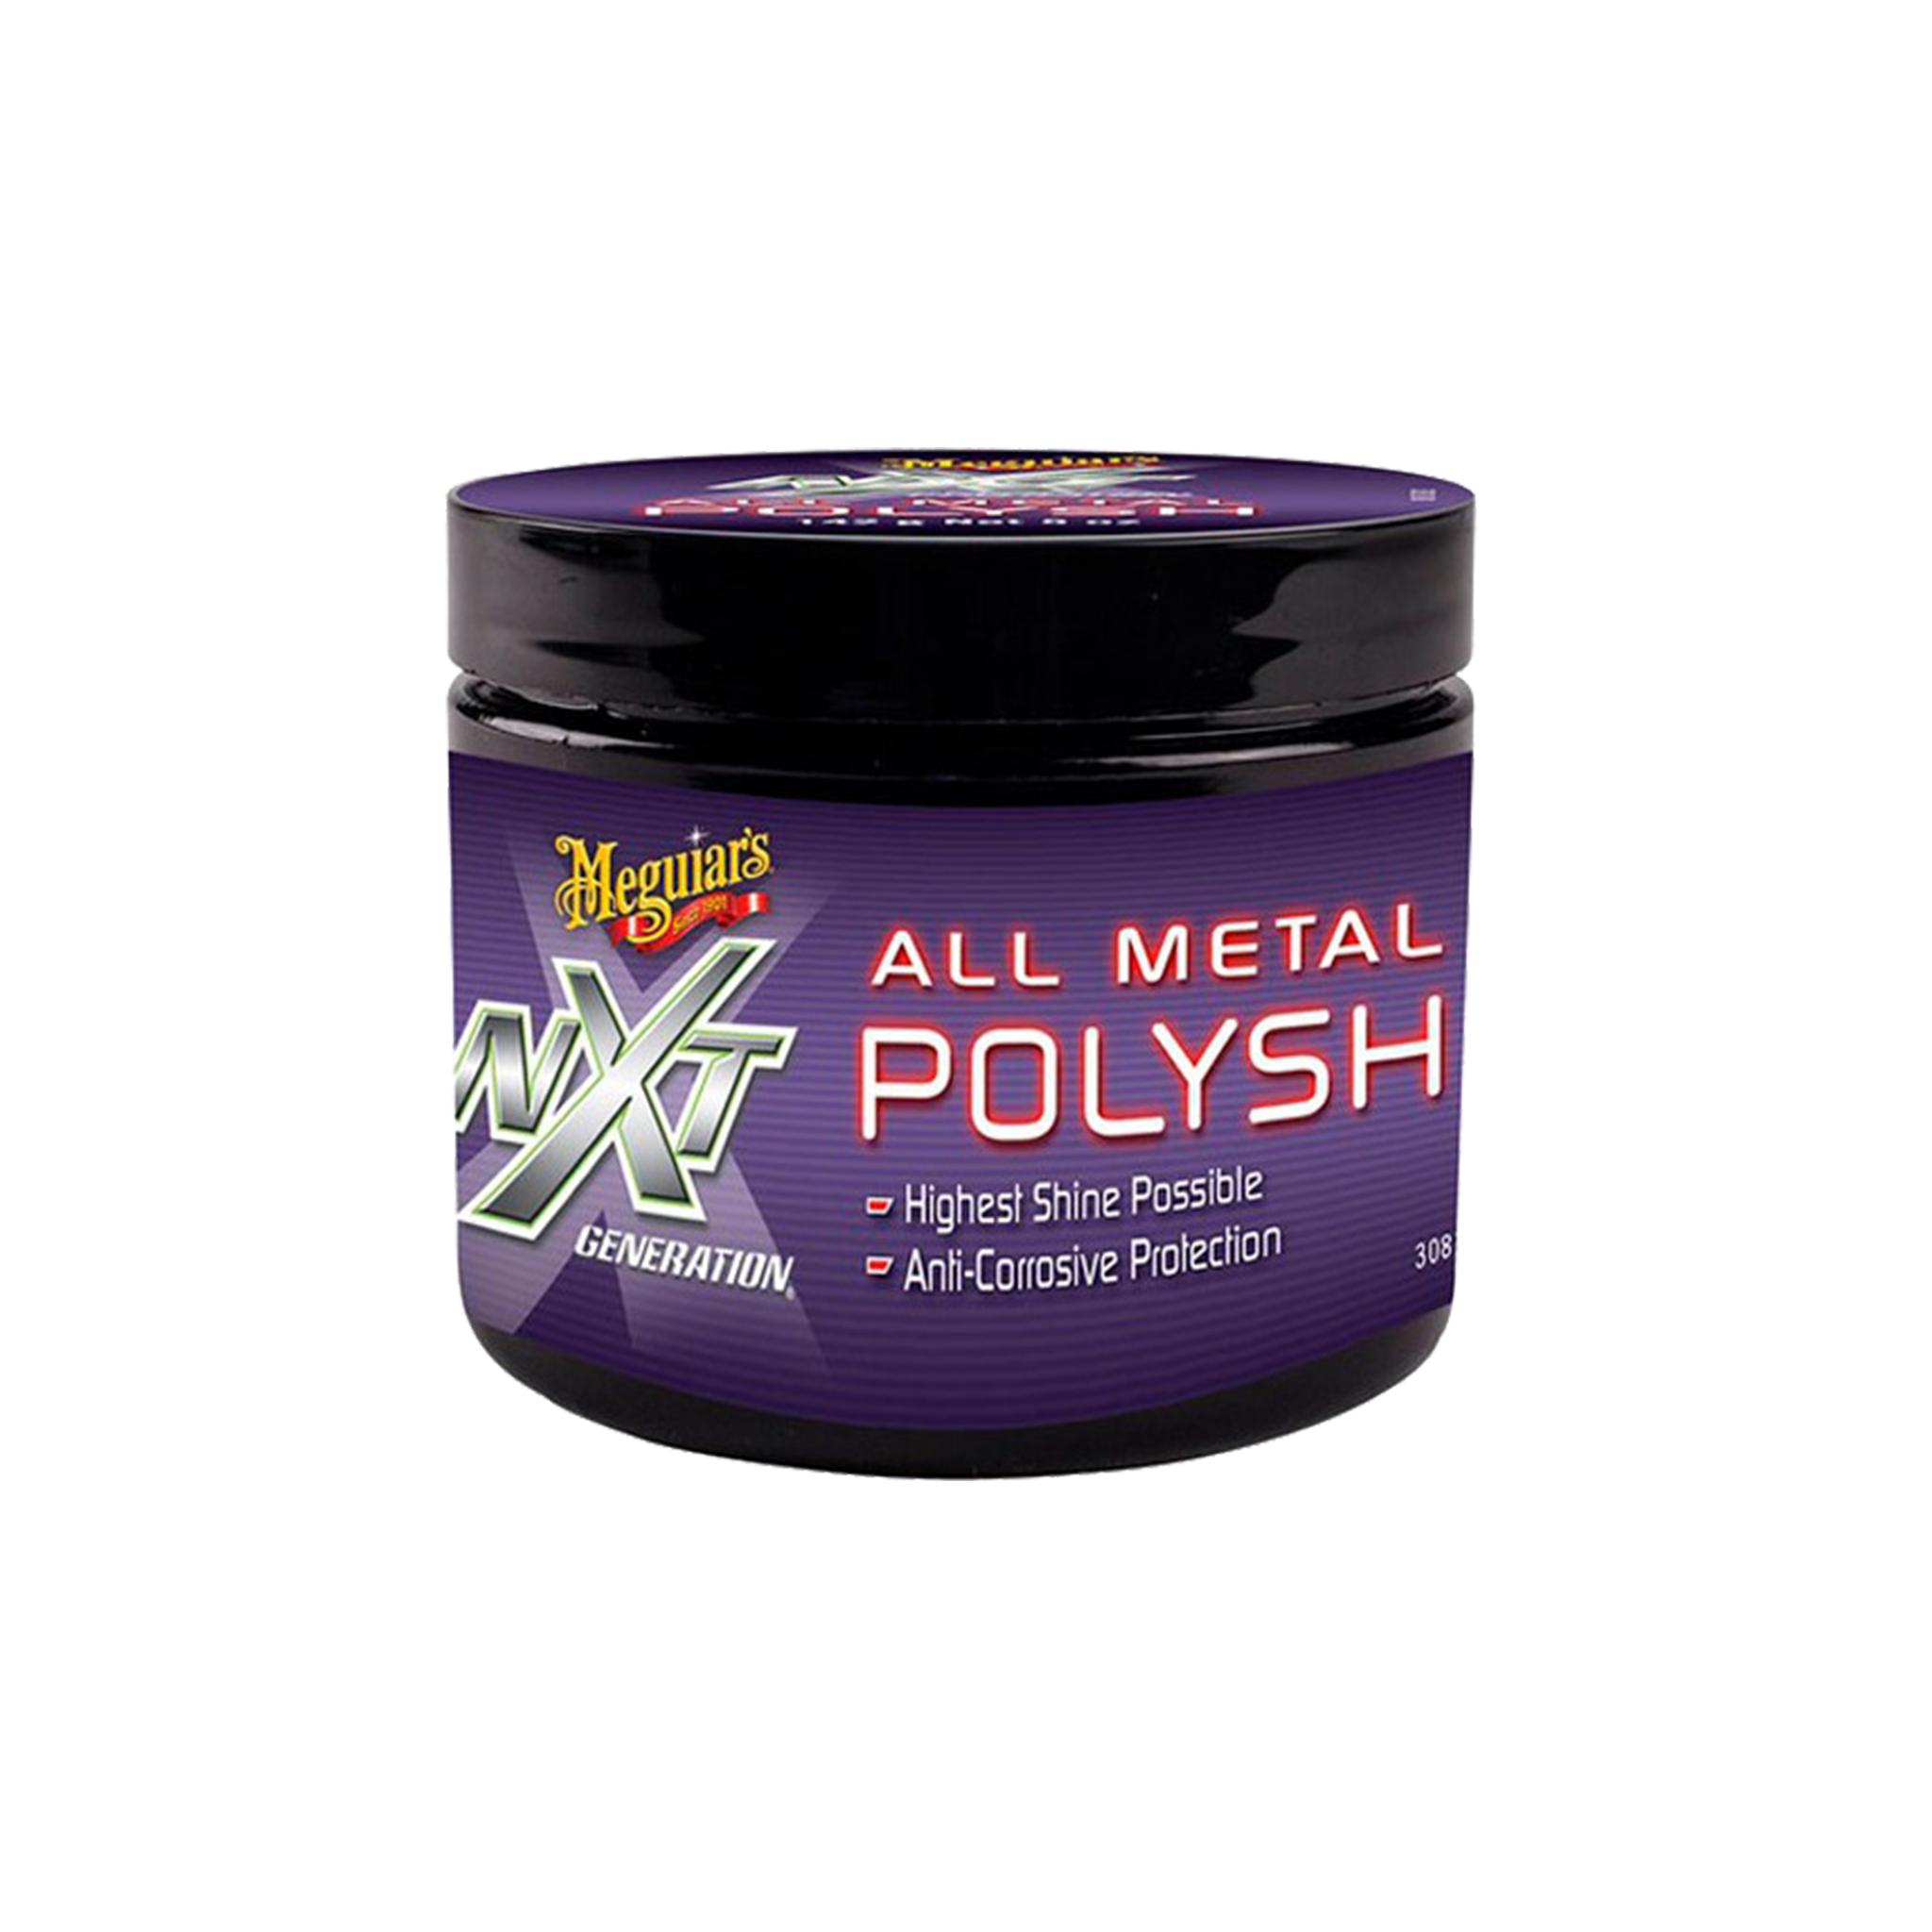 Metallpolermedel Meguiars NXT Generation Metall Polysh, 142 g